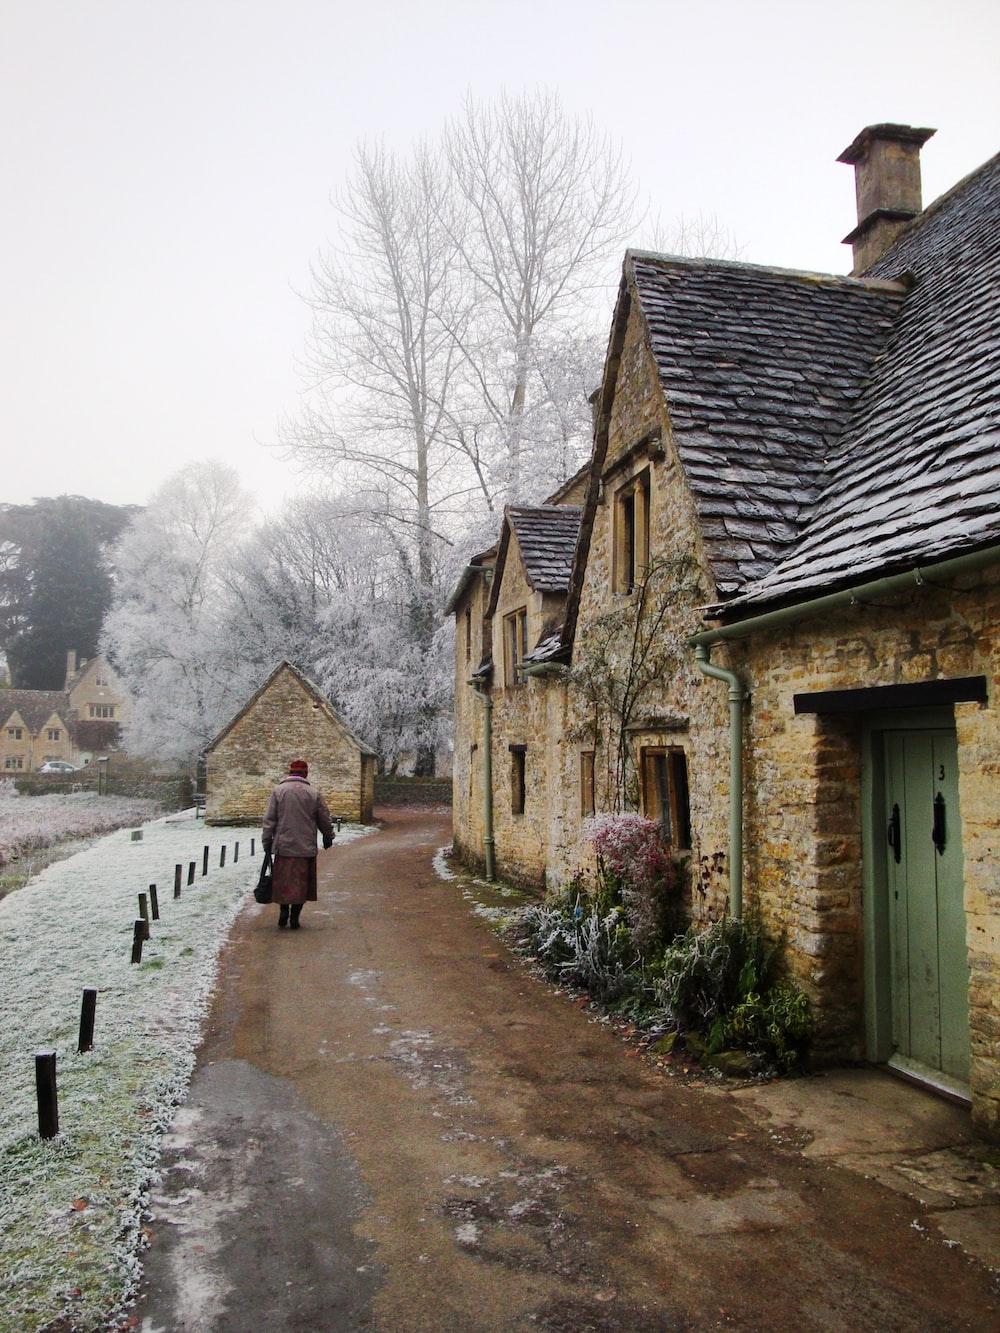 people walking on pathway between houses during daytime